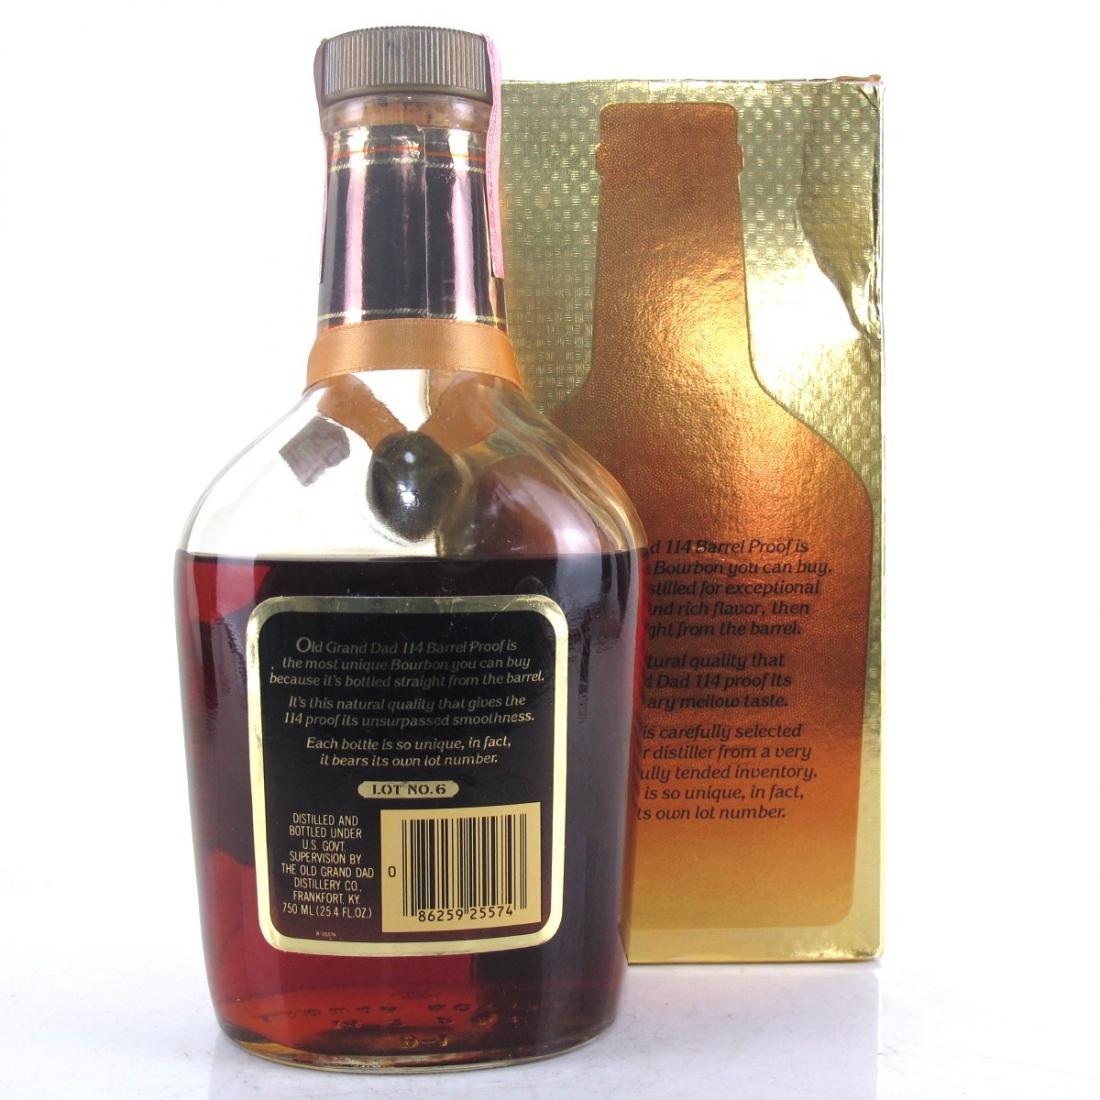 Old Grand-Dad 114 Proof Bourbon / Lot No.6 National Distilleries